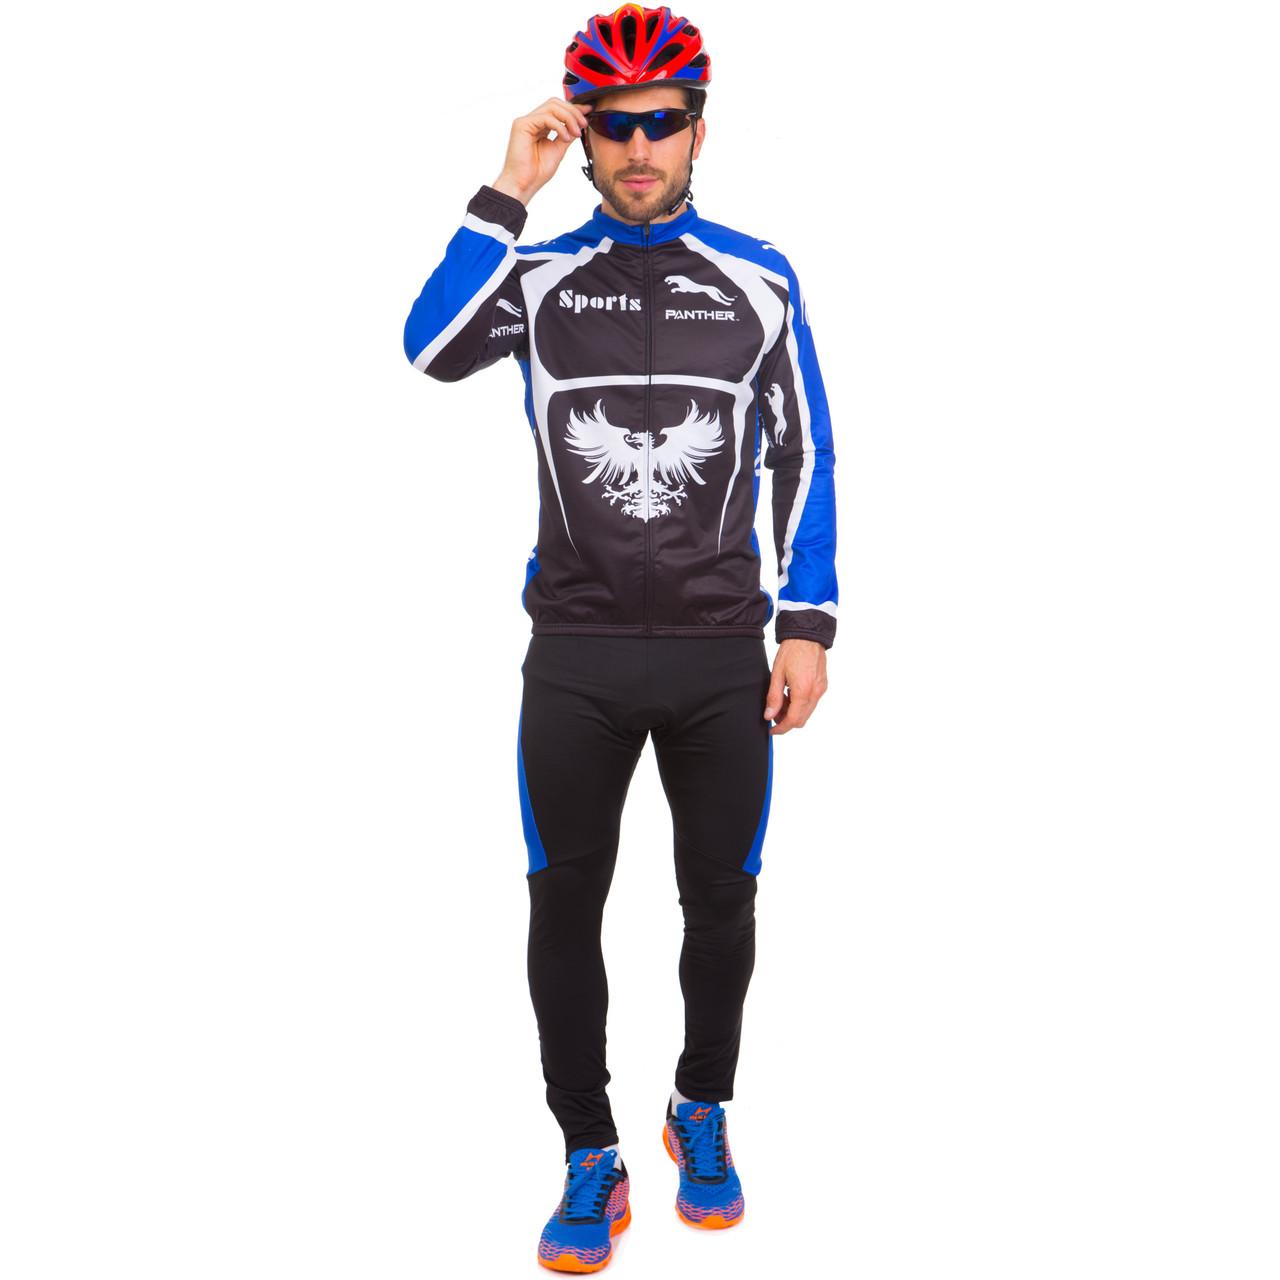 Велоформа длинный рукав утепленная Panther (XL-XXL (46-52), черный-синий) XL (46-48) PZ-NA-LJ-1404_1